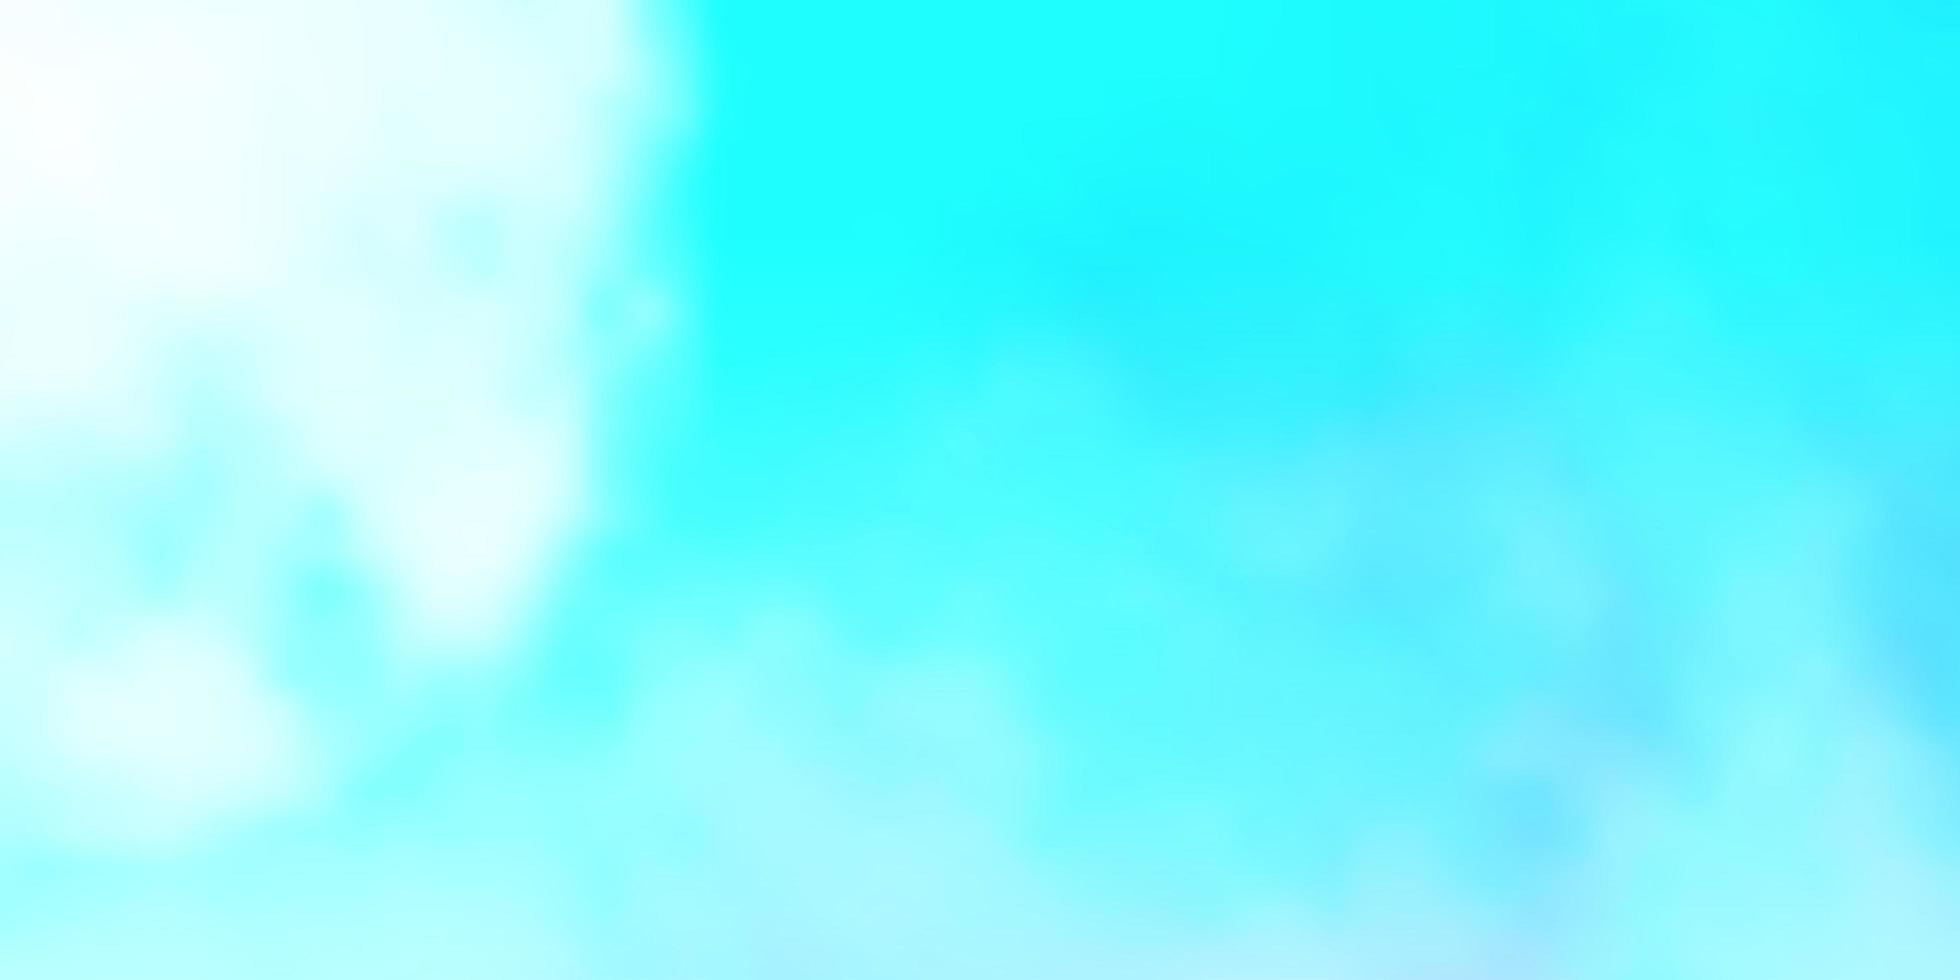 hellblaue Vektorbeschaffenheit mit bewölktem Himmel. vektor